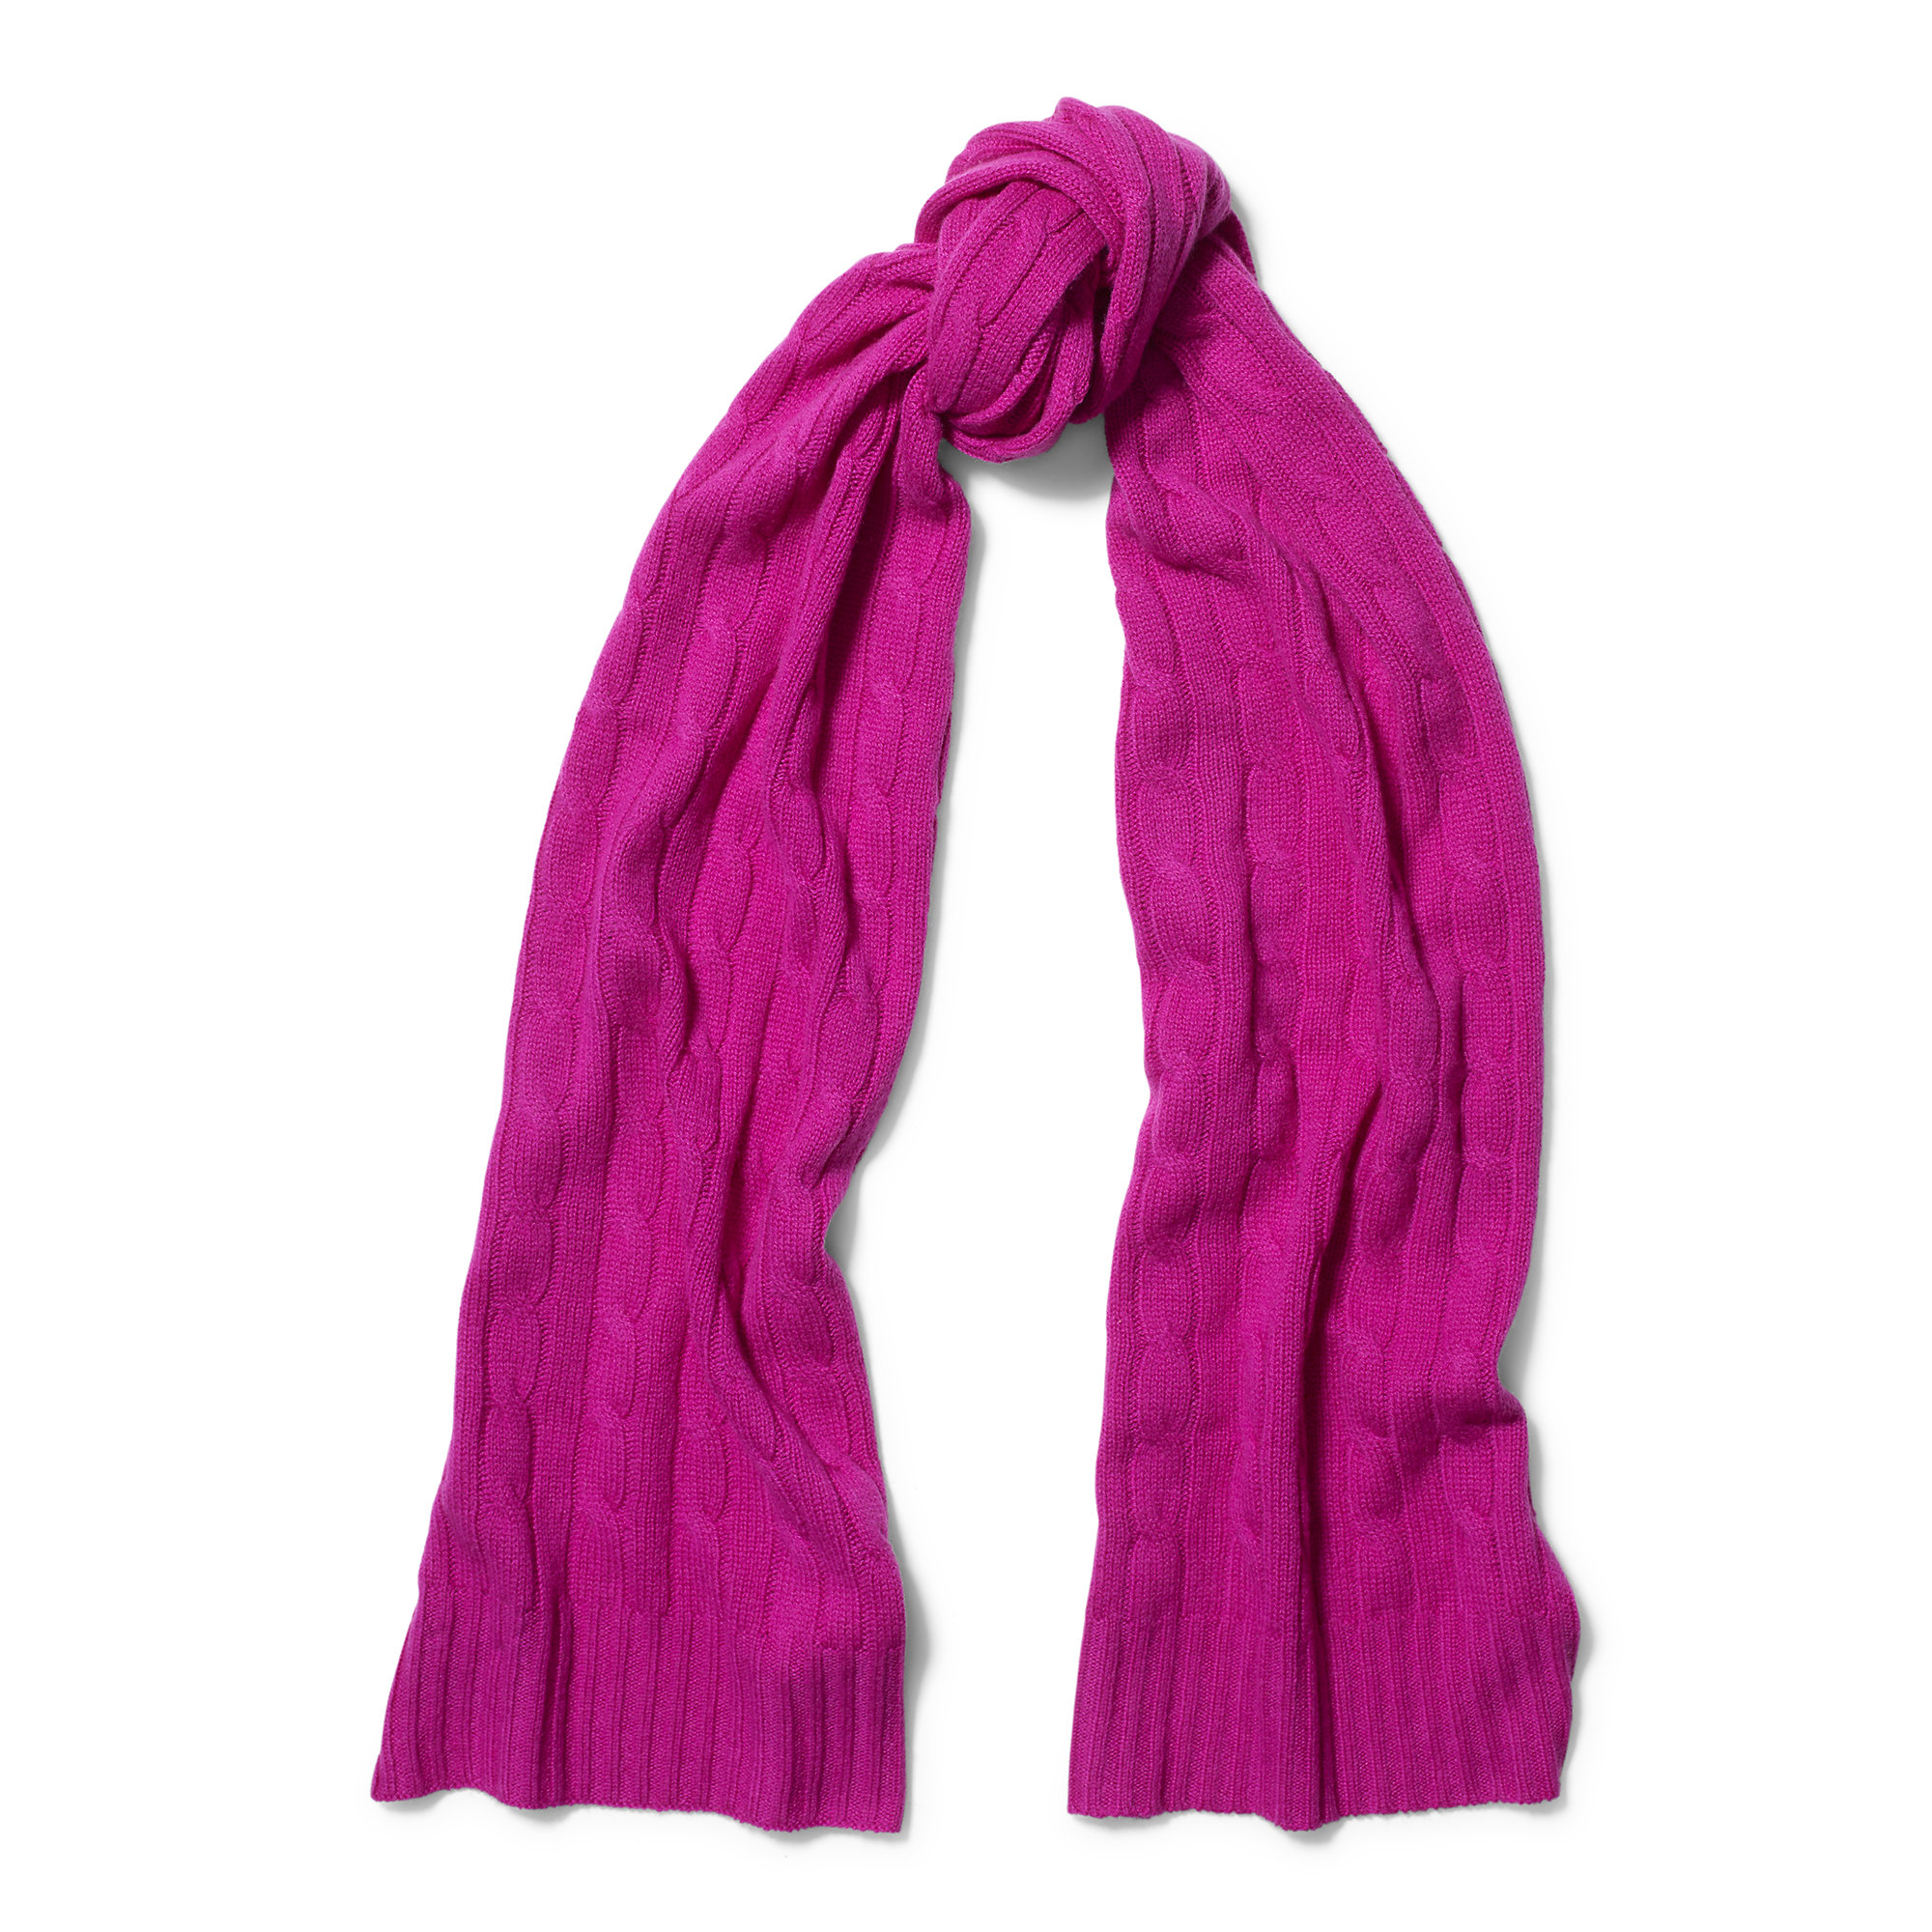 Polo Ralph Lauren Purple Cable-knit Cashmere Scarf Lyst